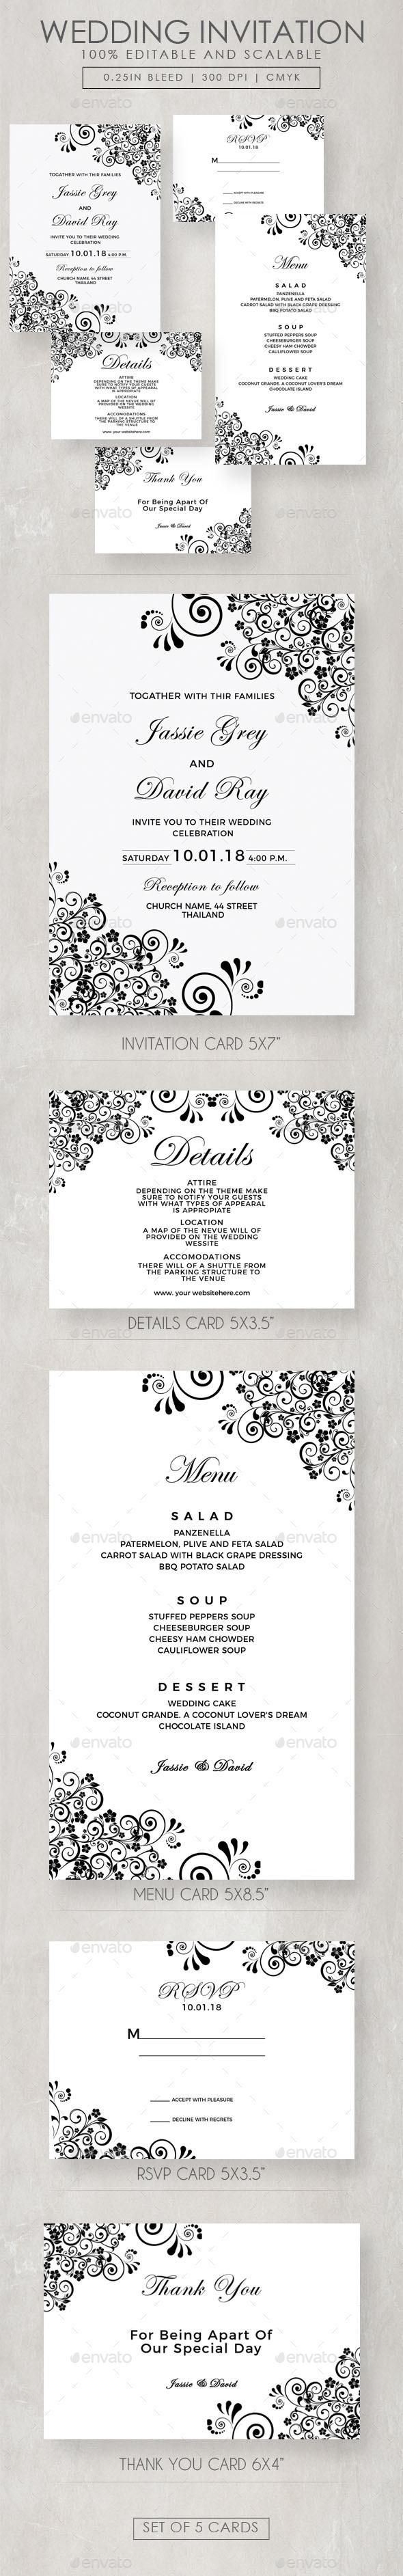 Wedding Invitation Templates From Graphicriver